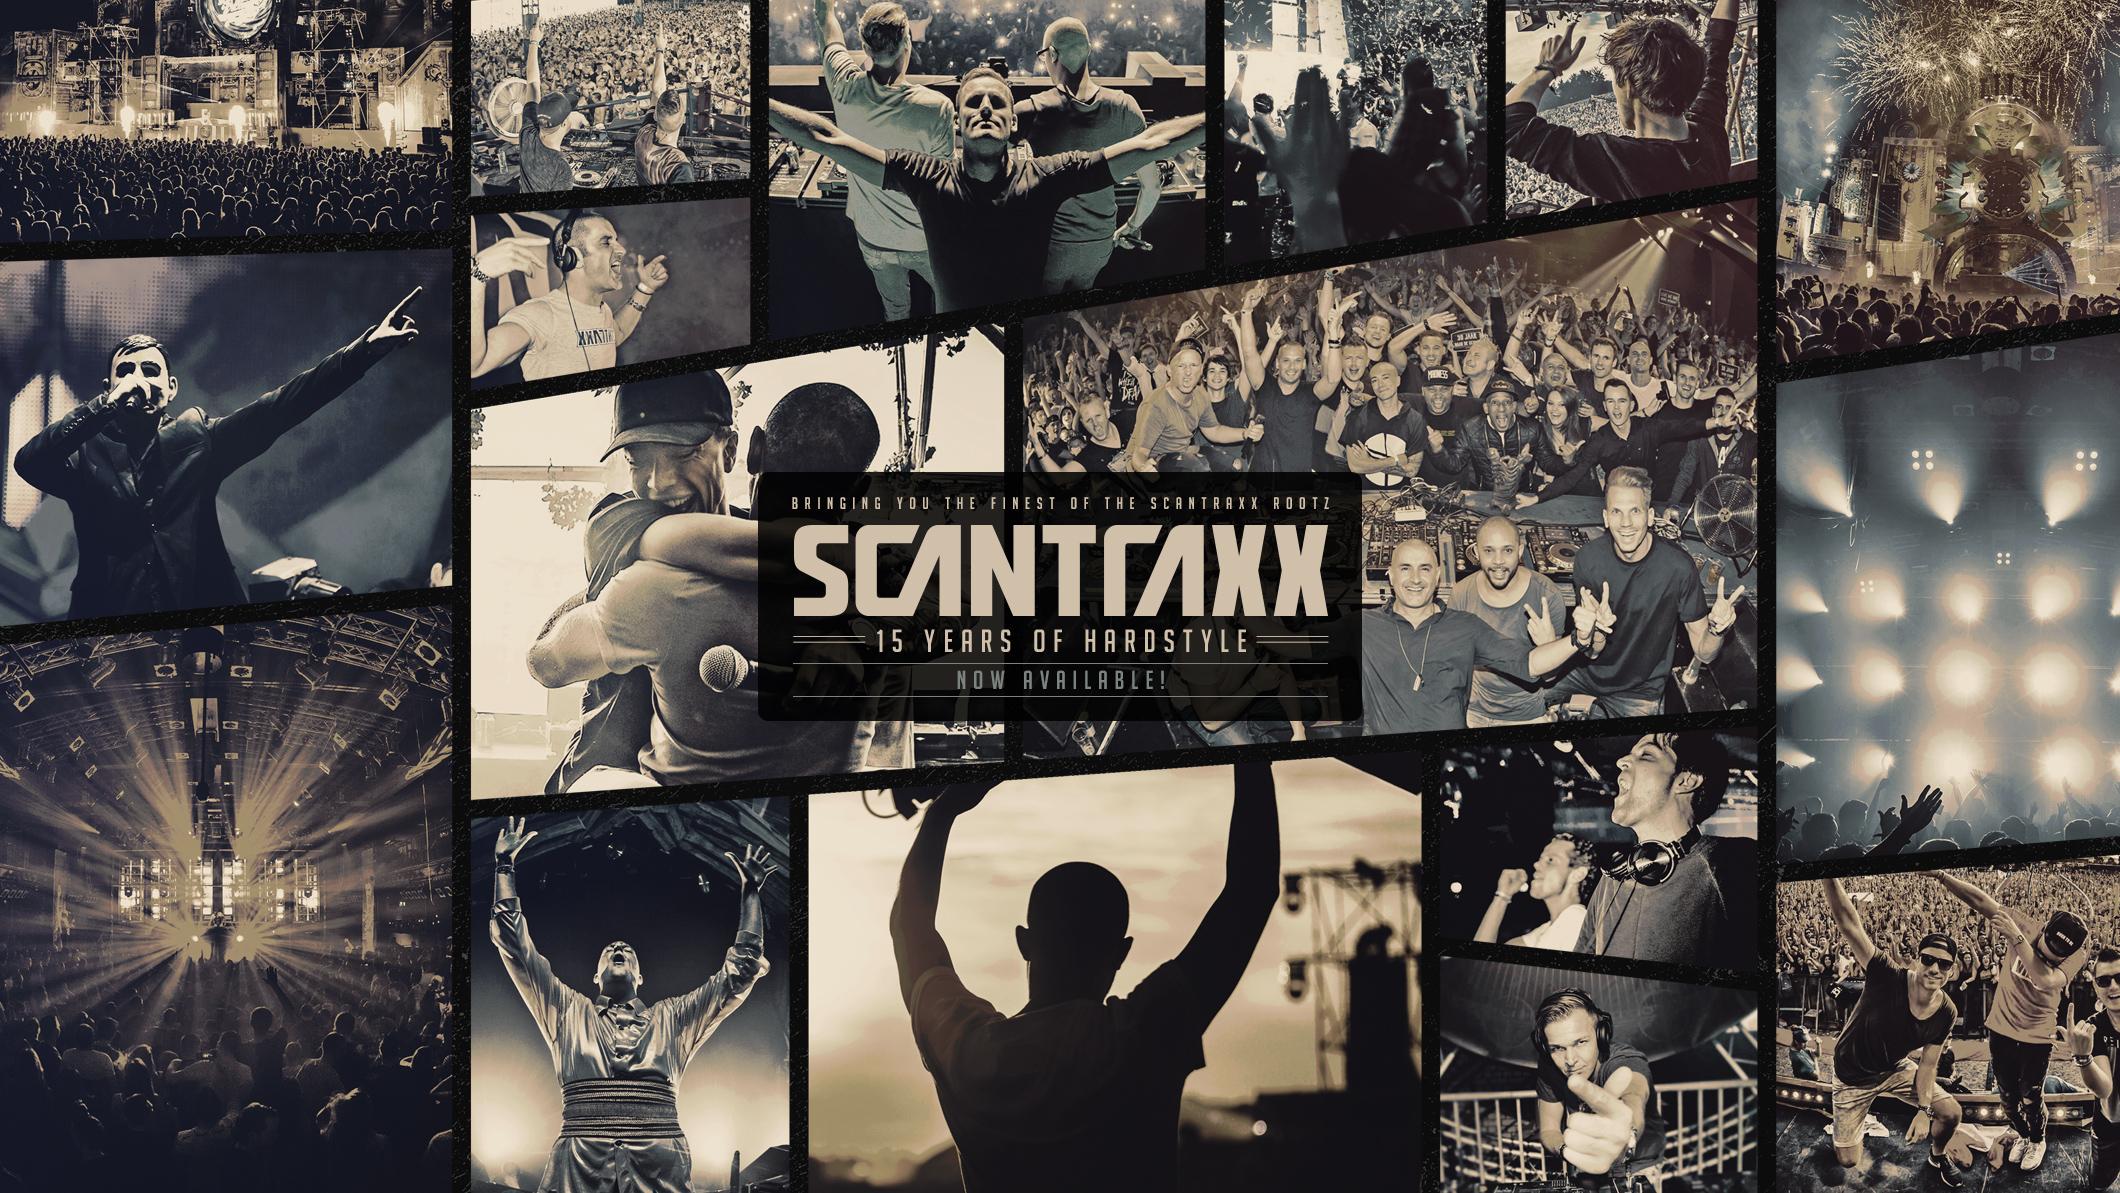 Scantraxx recordz 15 jaar hardstyle in mooie documentaire for Hardstyle house